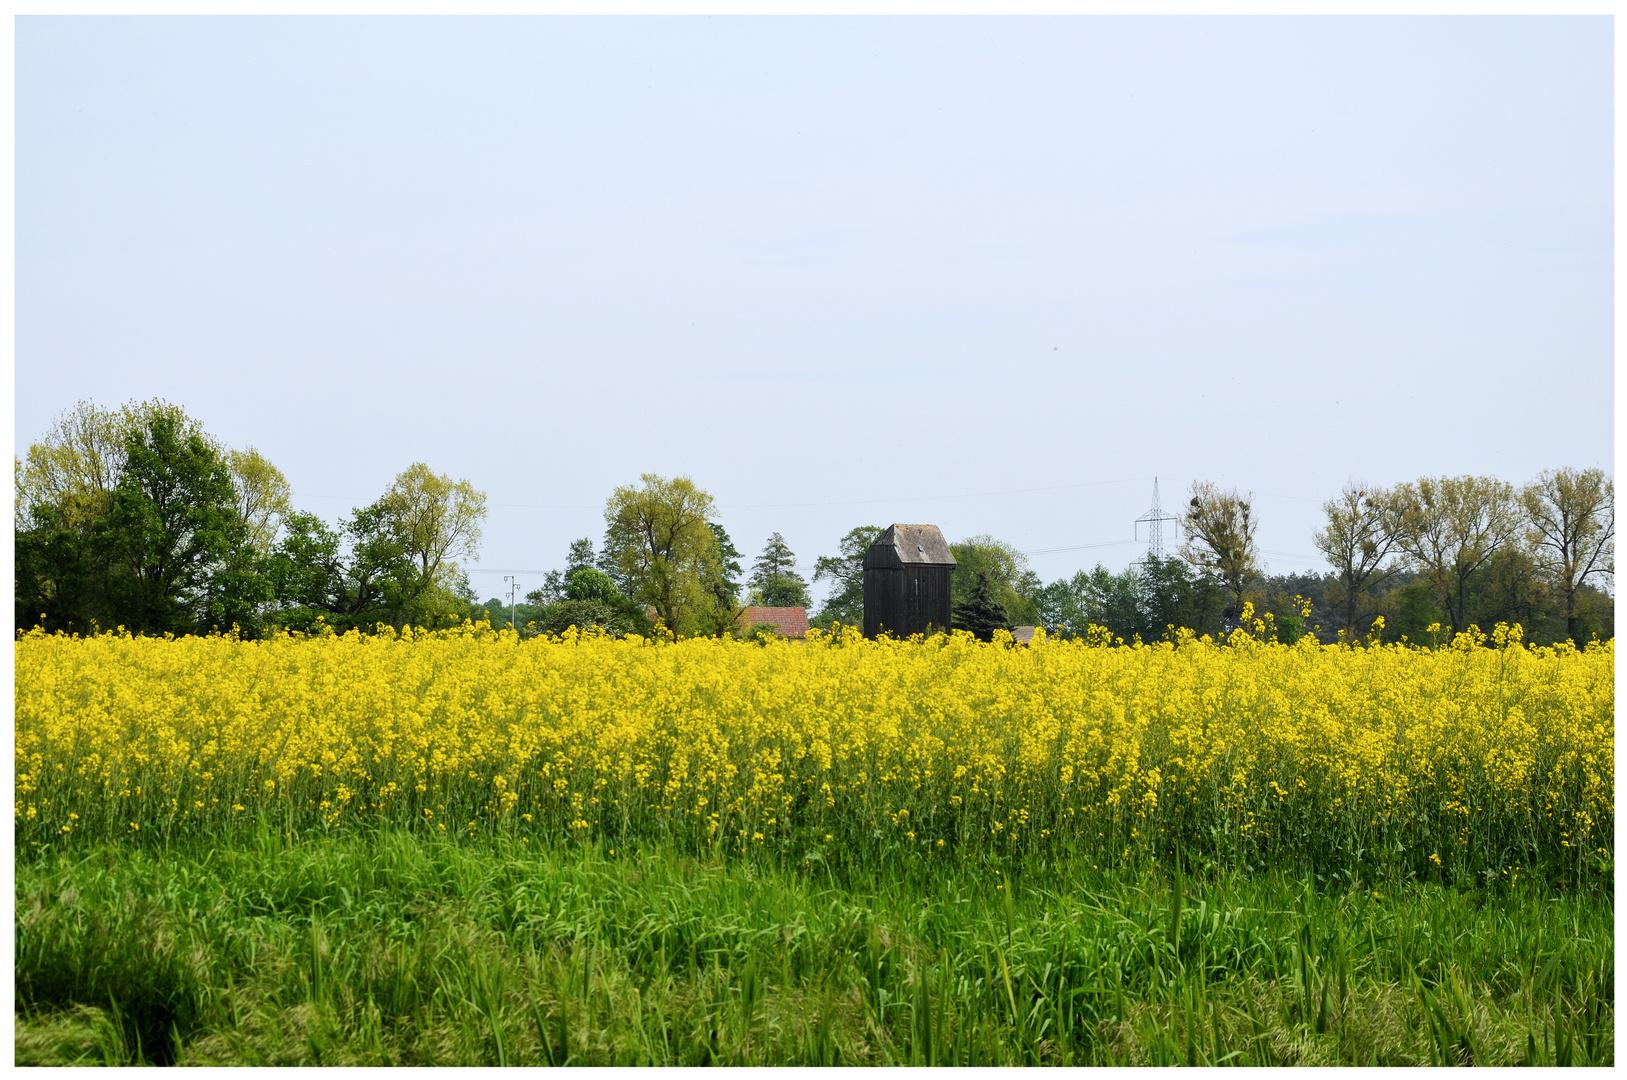 Rapsfeld und alte Windmühle